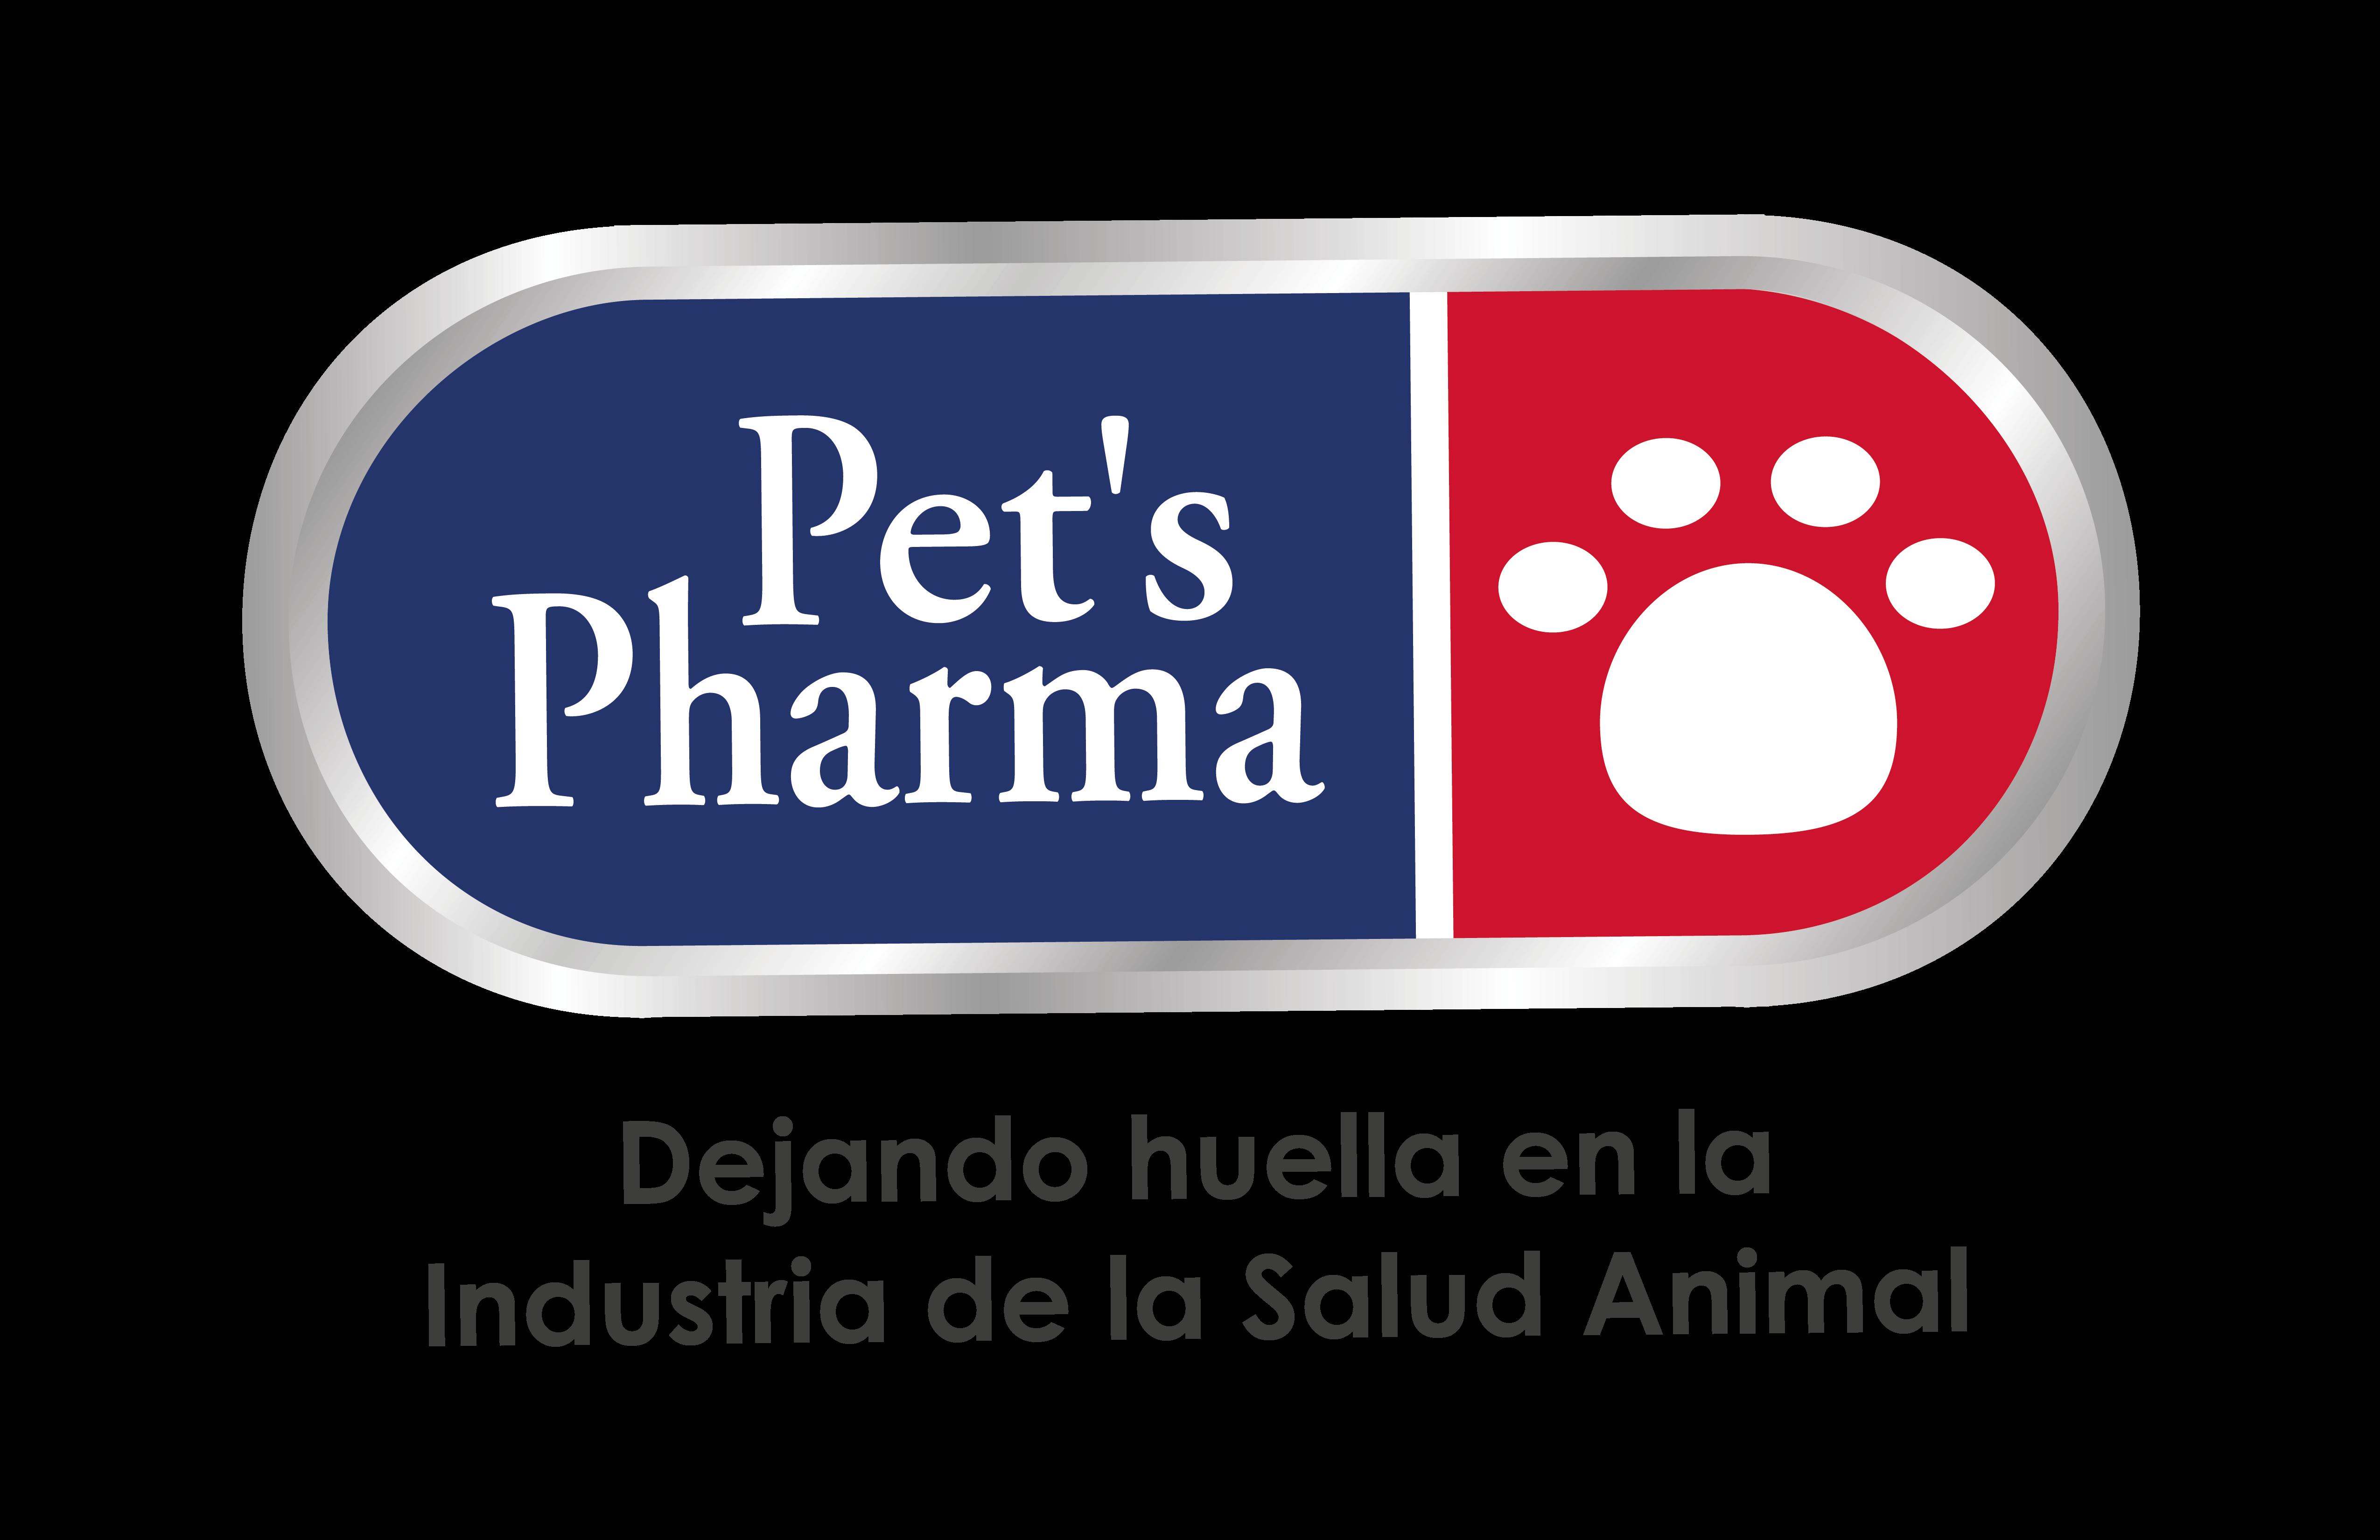 Pets Pharma